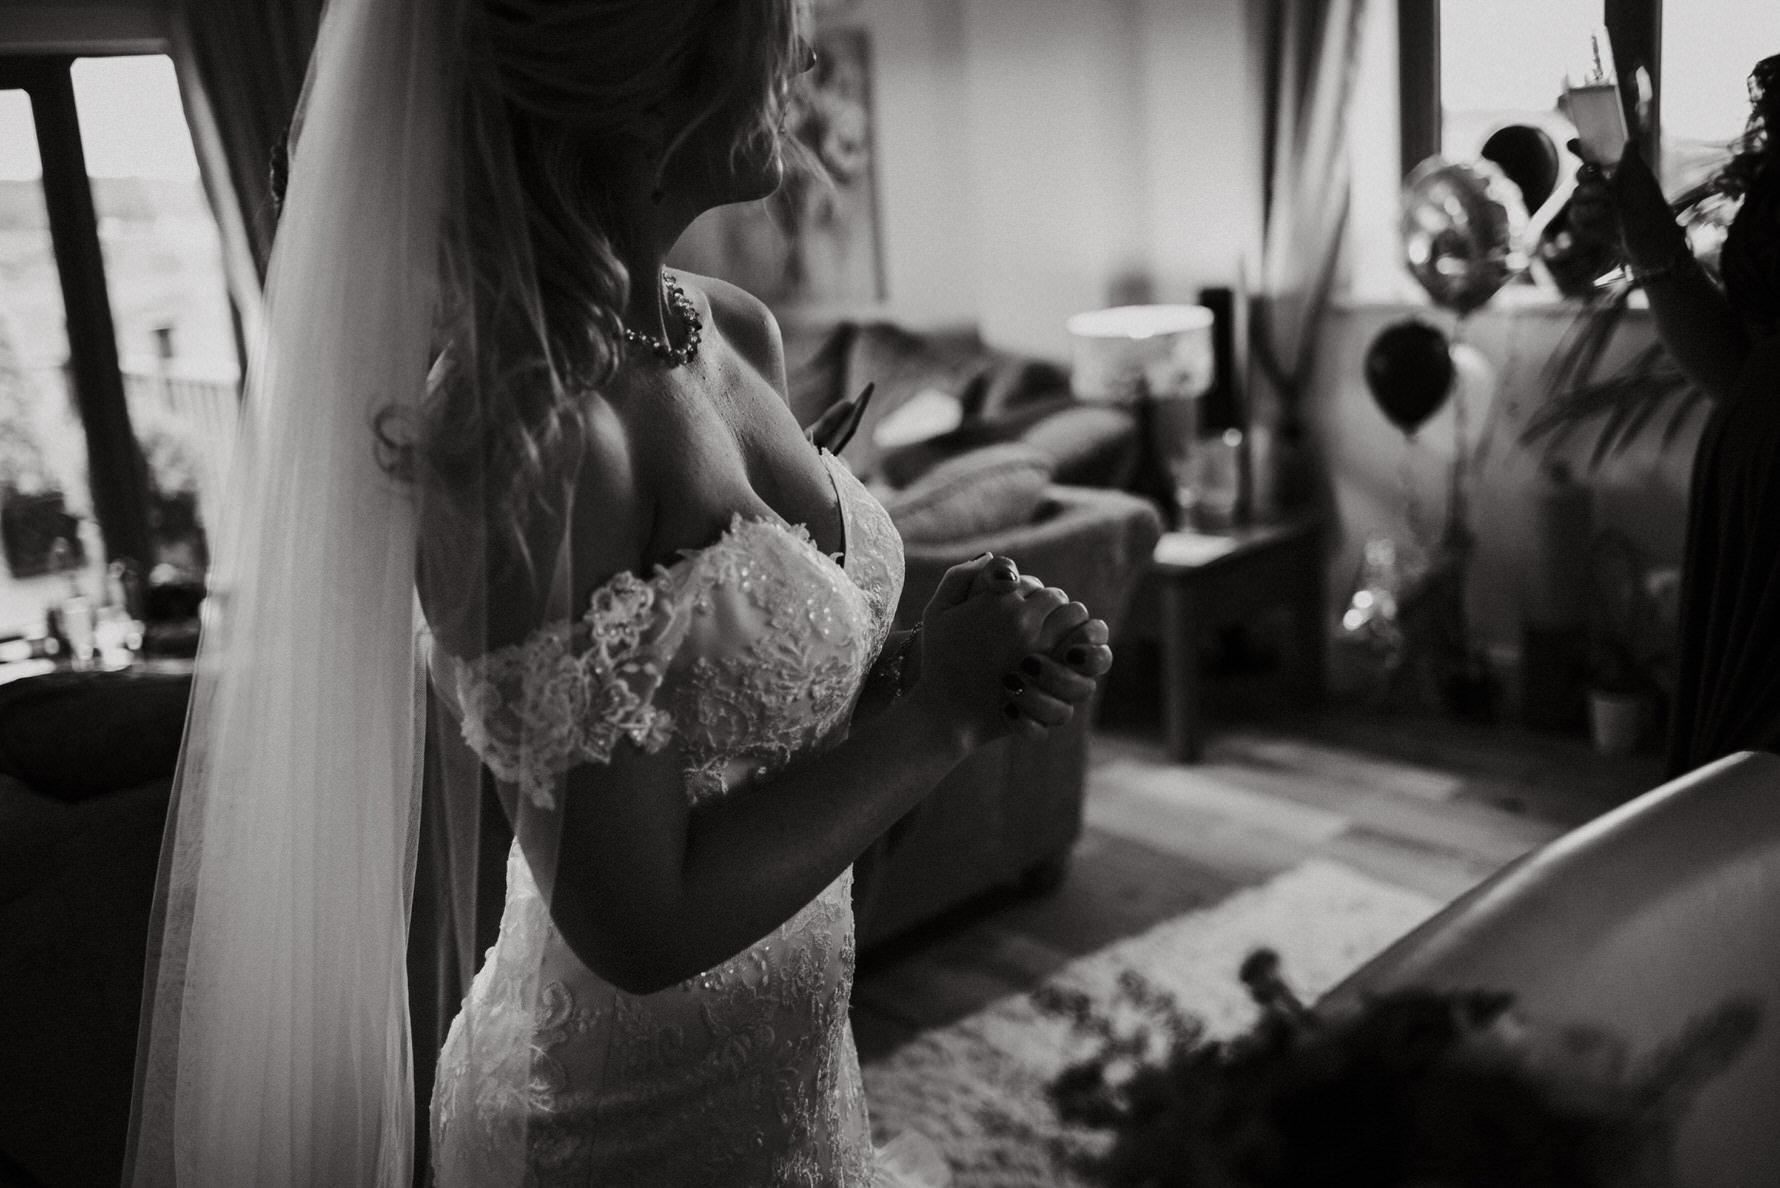 Cheshire Wedding Photojournalism  - A bride in her wedding dress